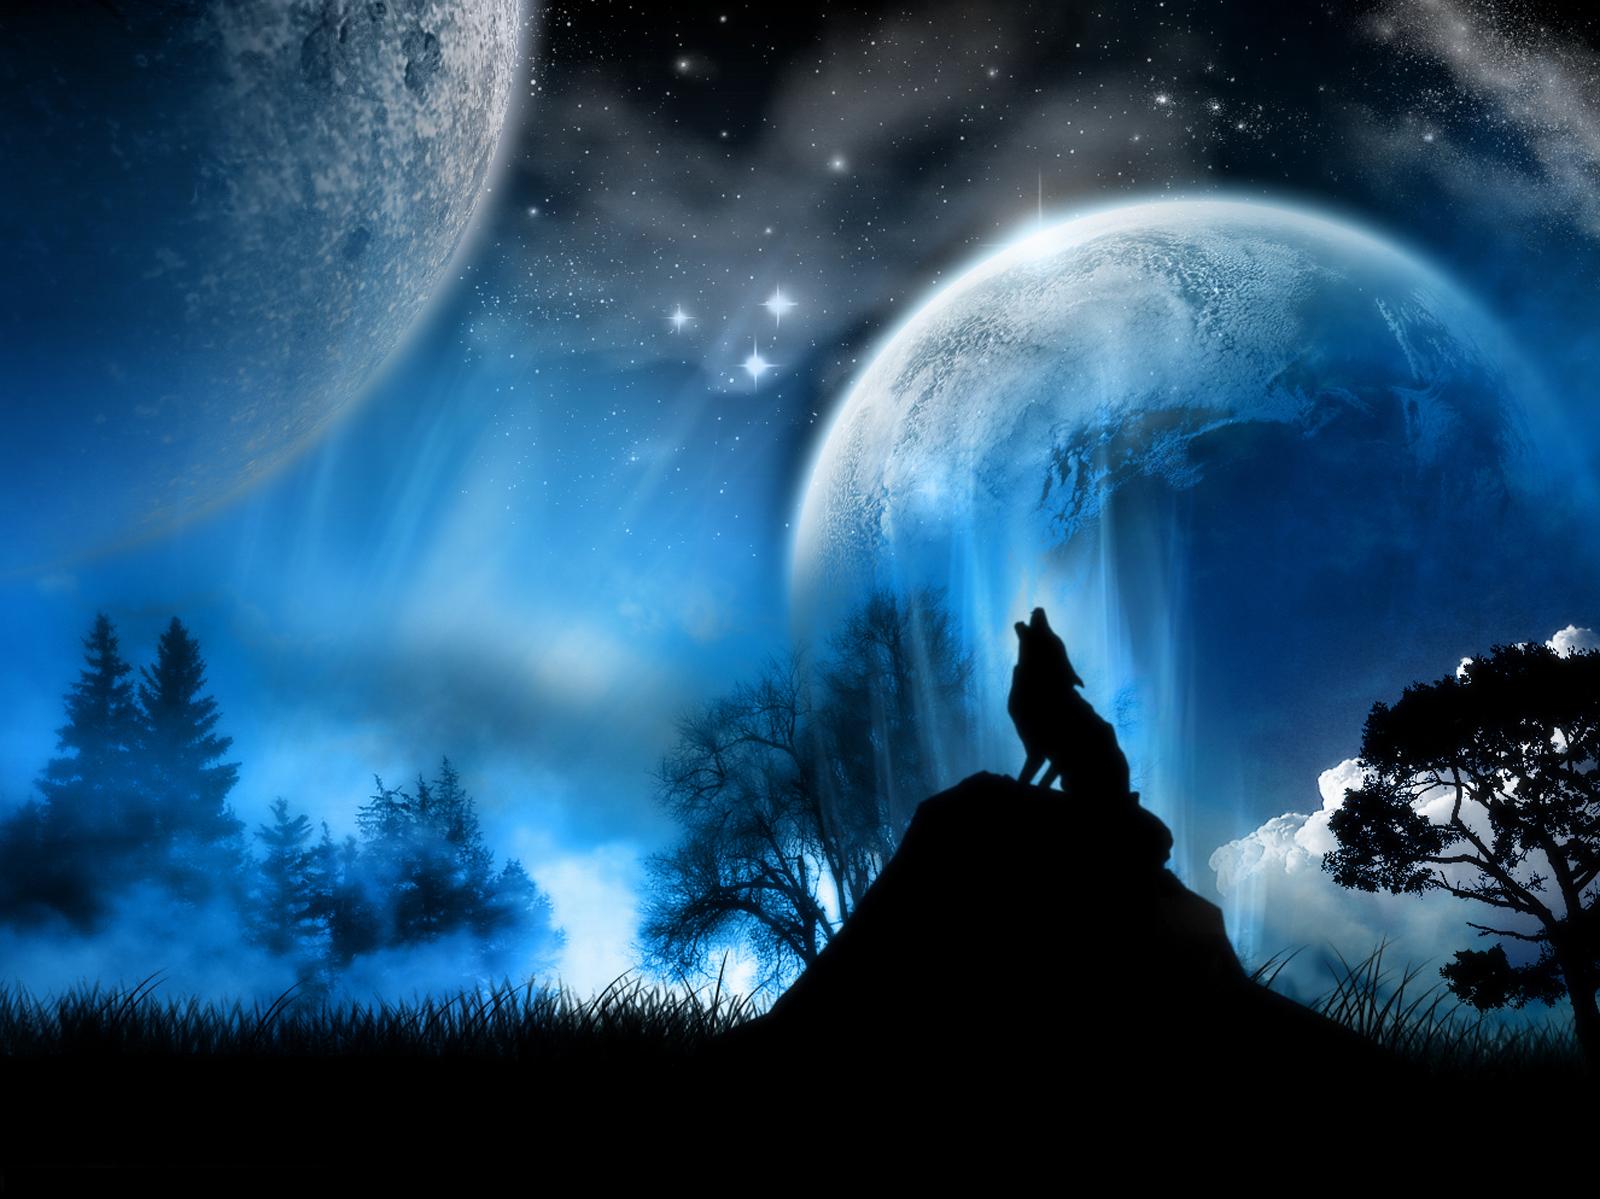 http://3.bp.blogspot.com/-R7j90-G4dOA/Tf-0fWBXo2I/AAAAAAAAAT0/LQ5QeXBJDMs/s1600/wolf-at-moonlight-wallpaper-1600-1199.jpg